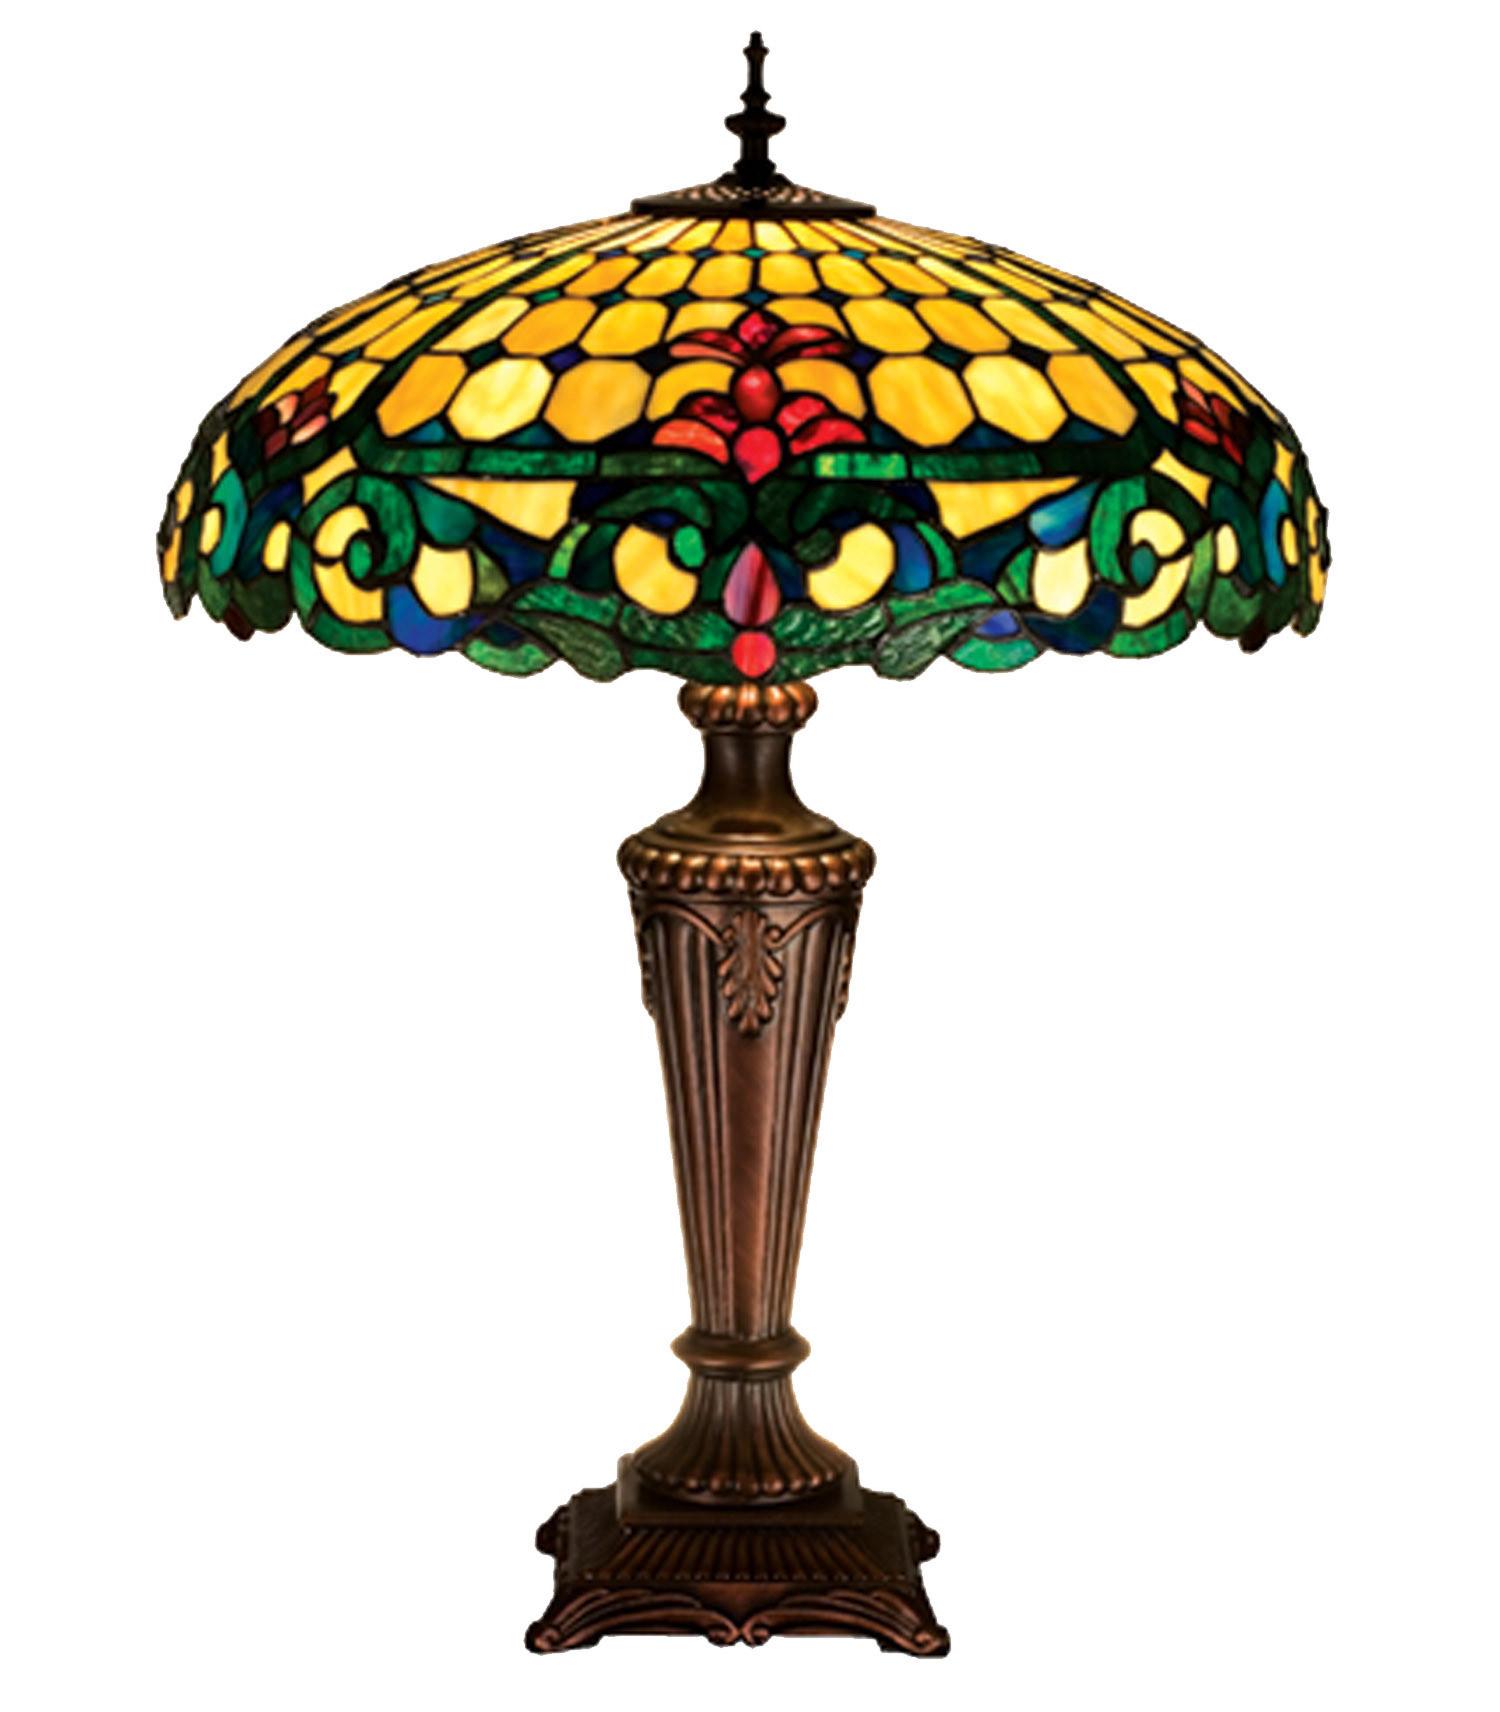 meyda 15707 tiffany table lamp. Black Bedroom Furniture Sets. Home Design Ideas